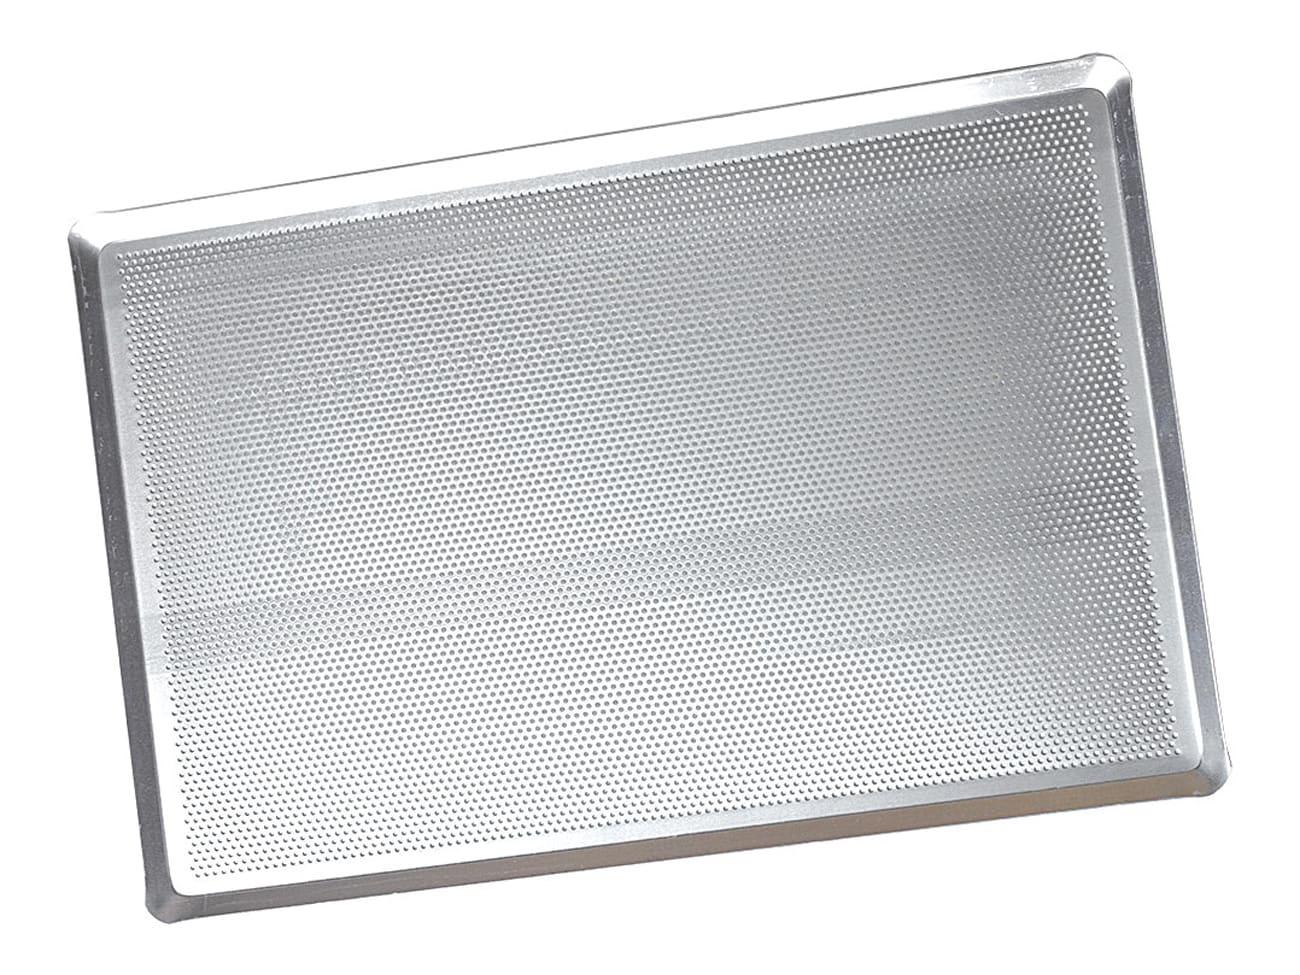 plaque a patisserie perforee aluminium 40 x 30 cm meilleur du chef